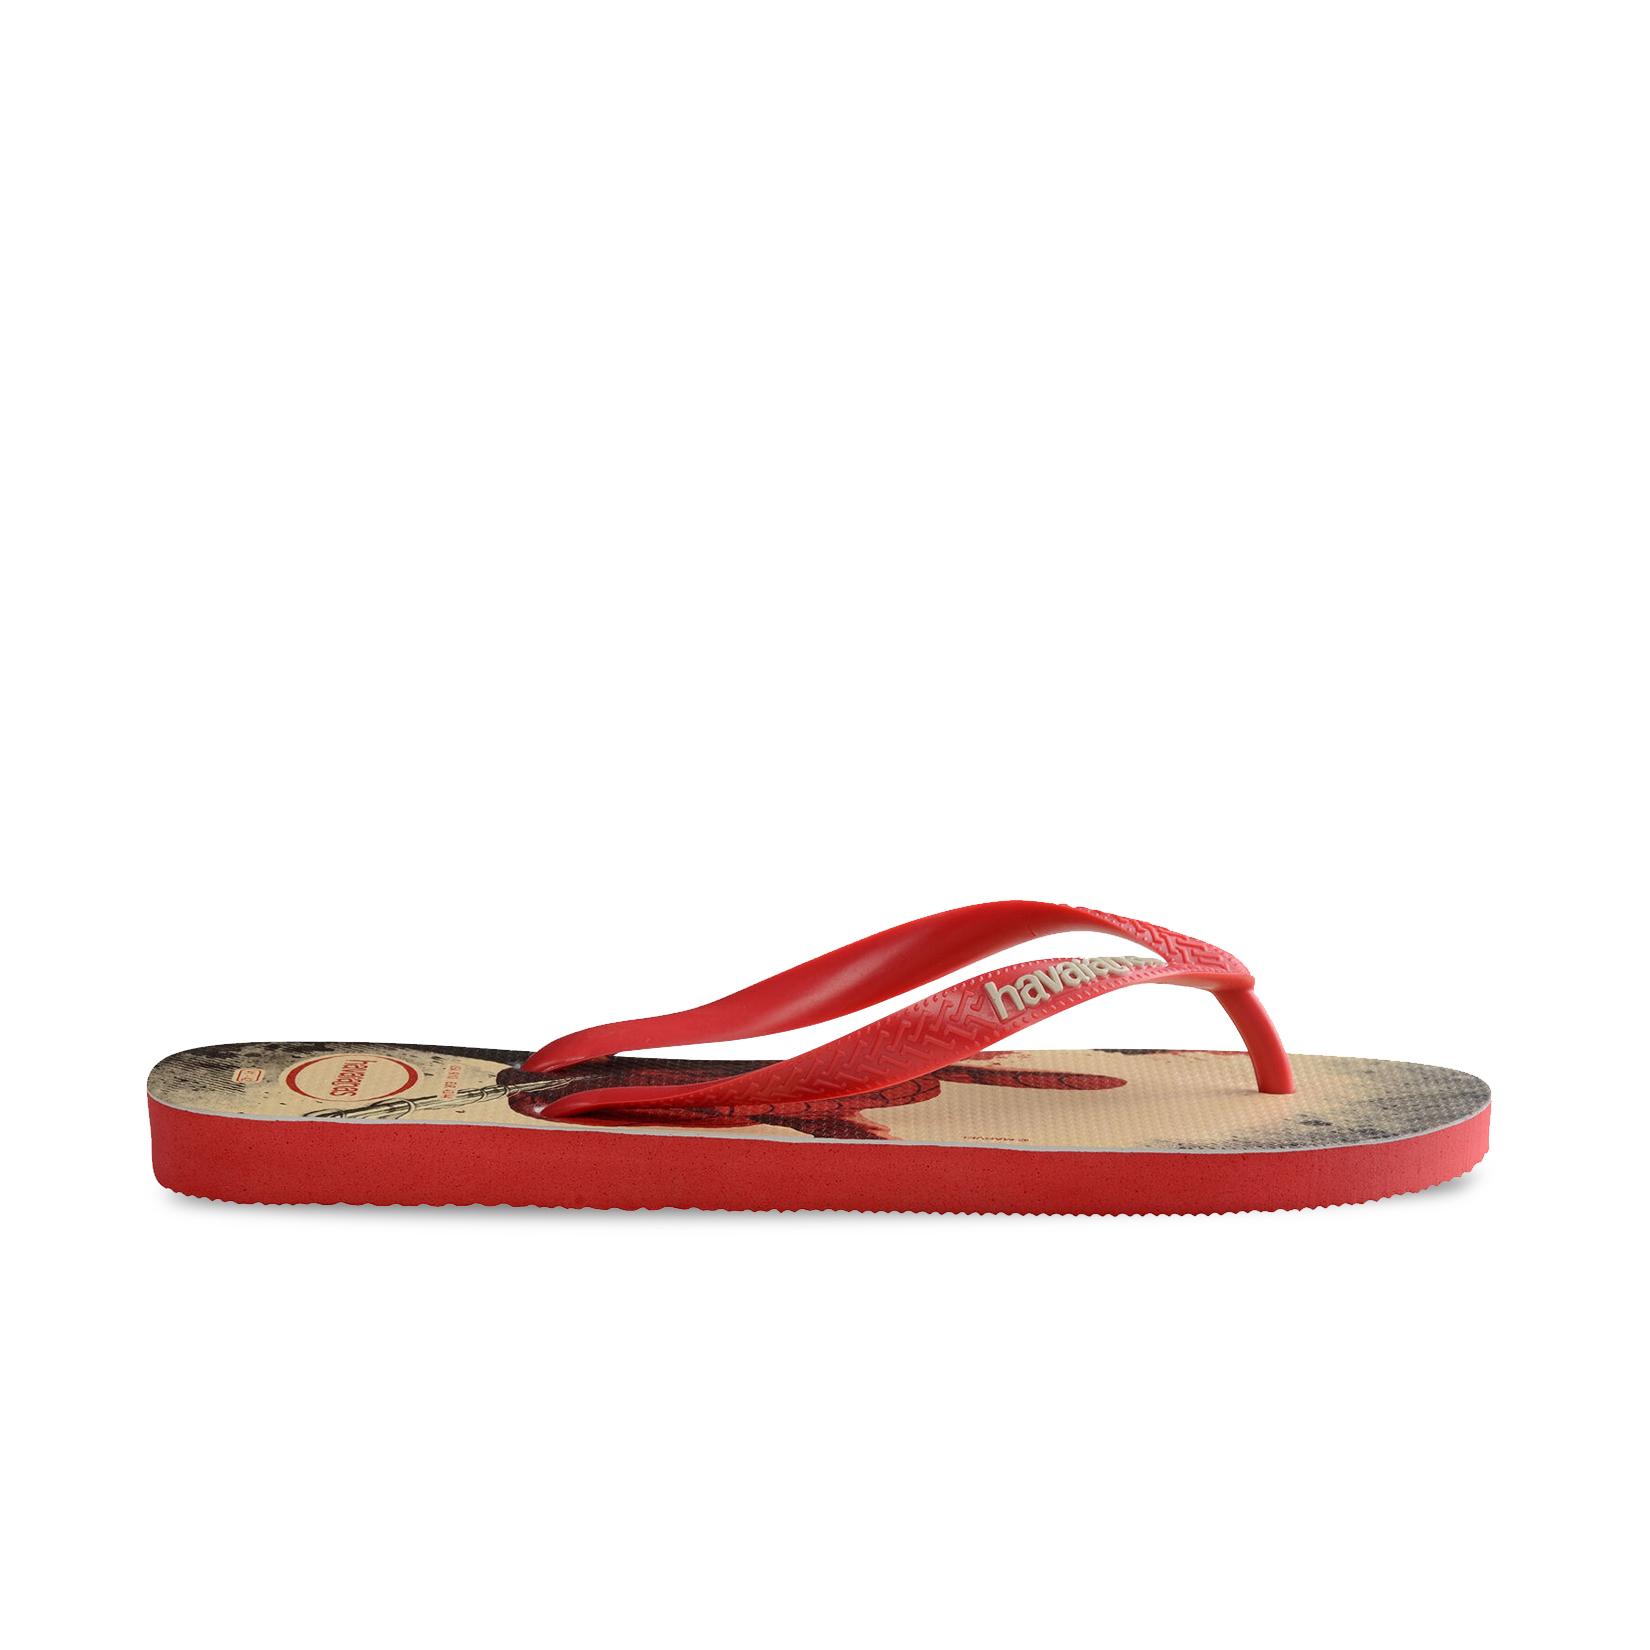 Havaianas Sandals Marvel Spiderman Red